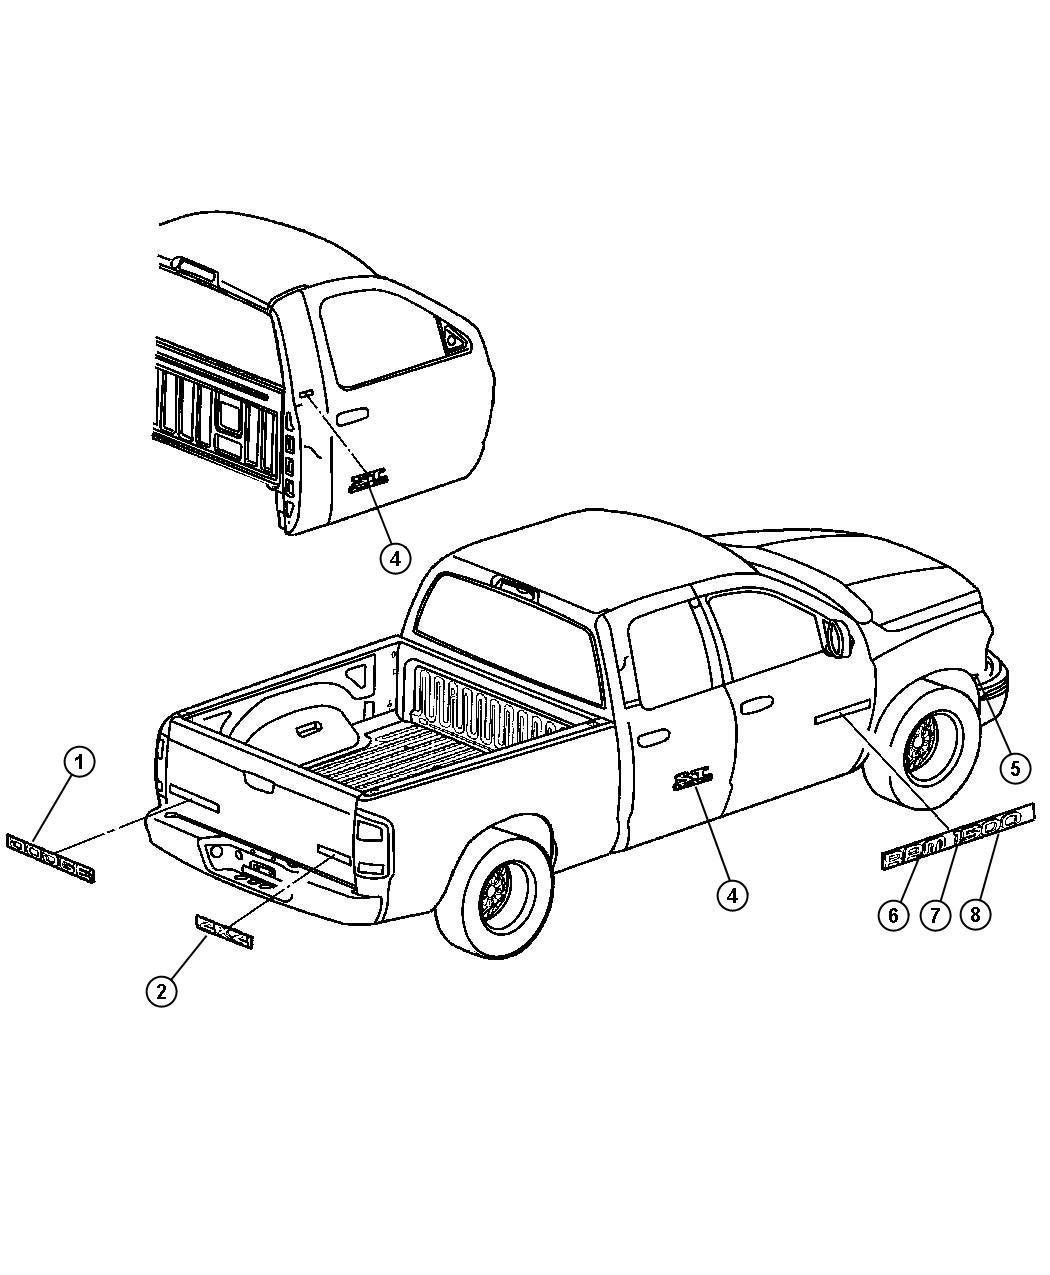 [DIAGRAM] Wiring Diagram For 2010 Dodge Ram 1500 Hemi FULL